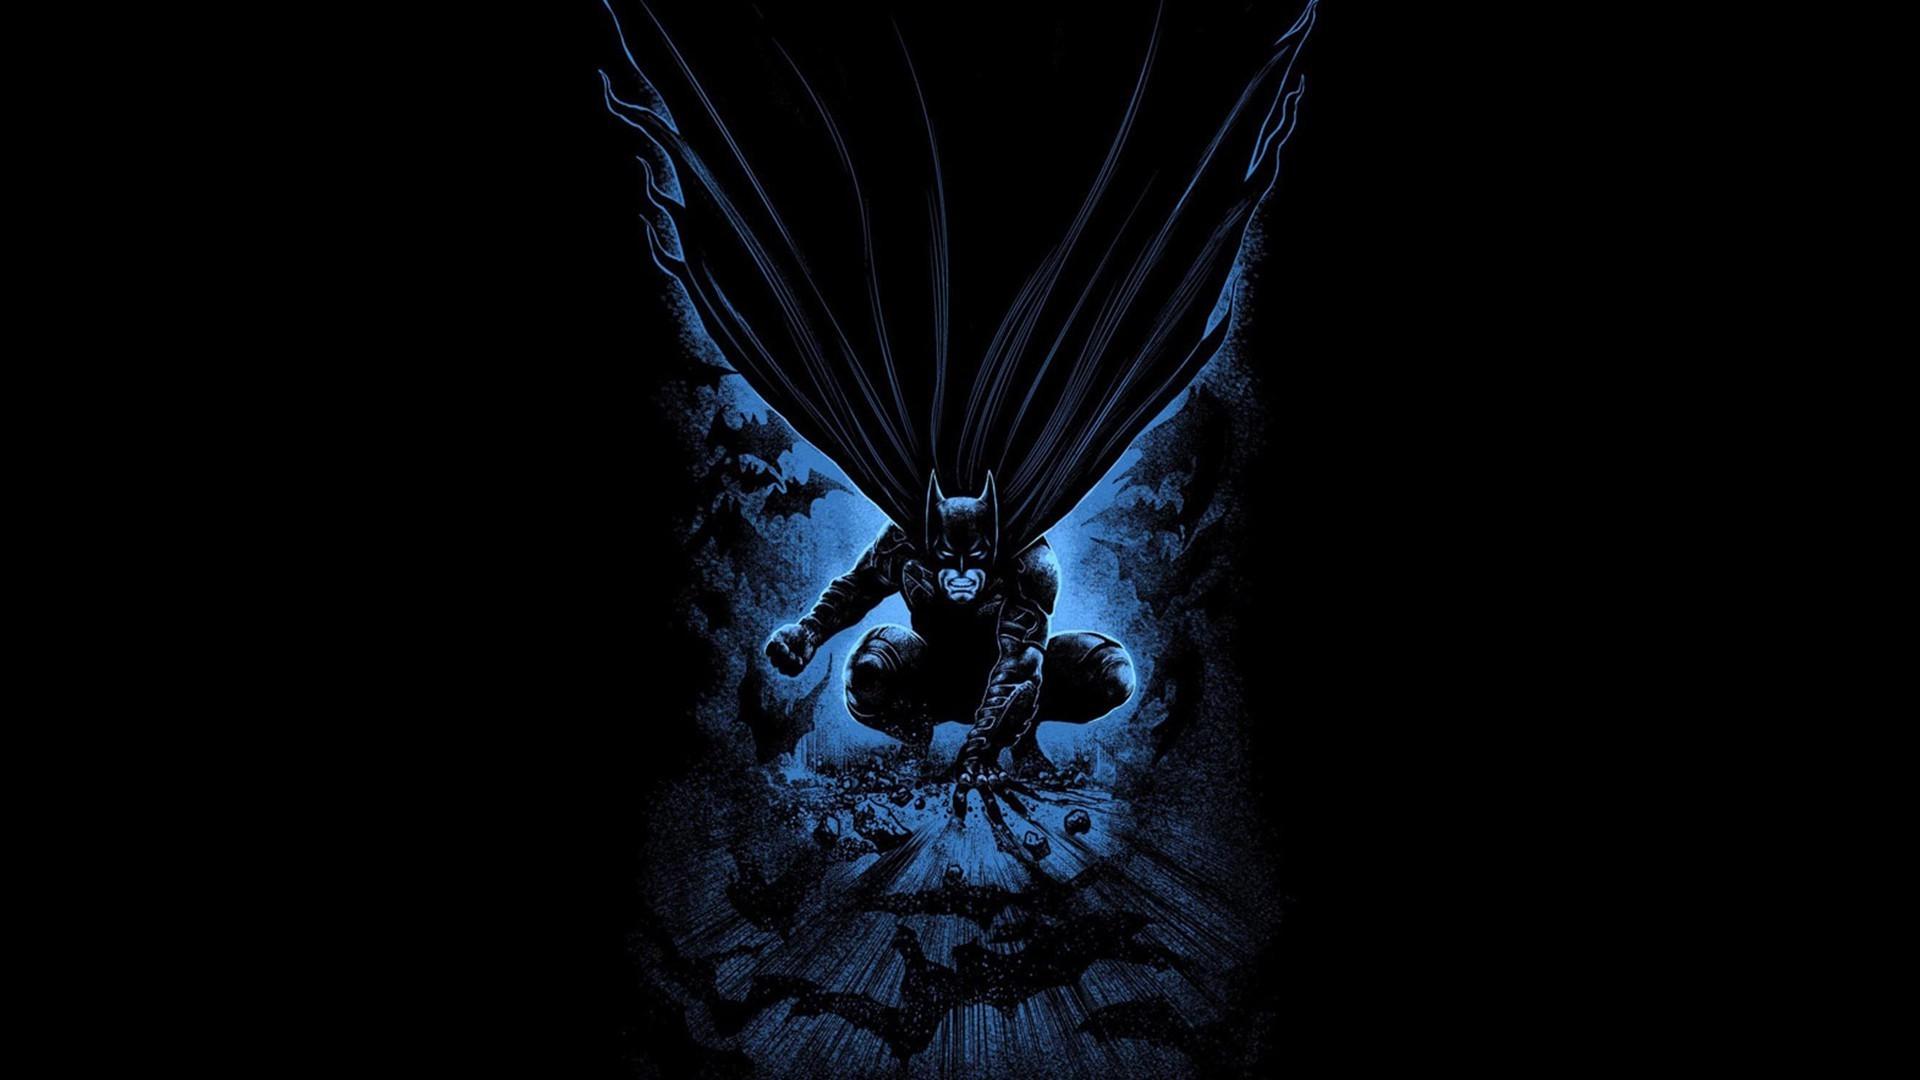 Batman & Nightwing | Nightwing | Pinterest | Robins, Nightwing and .